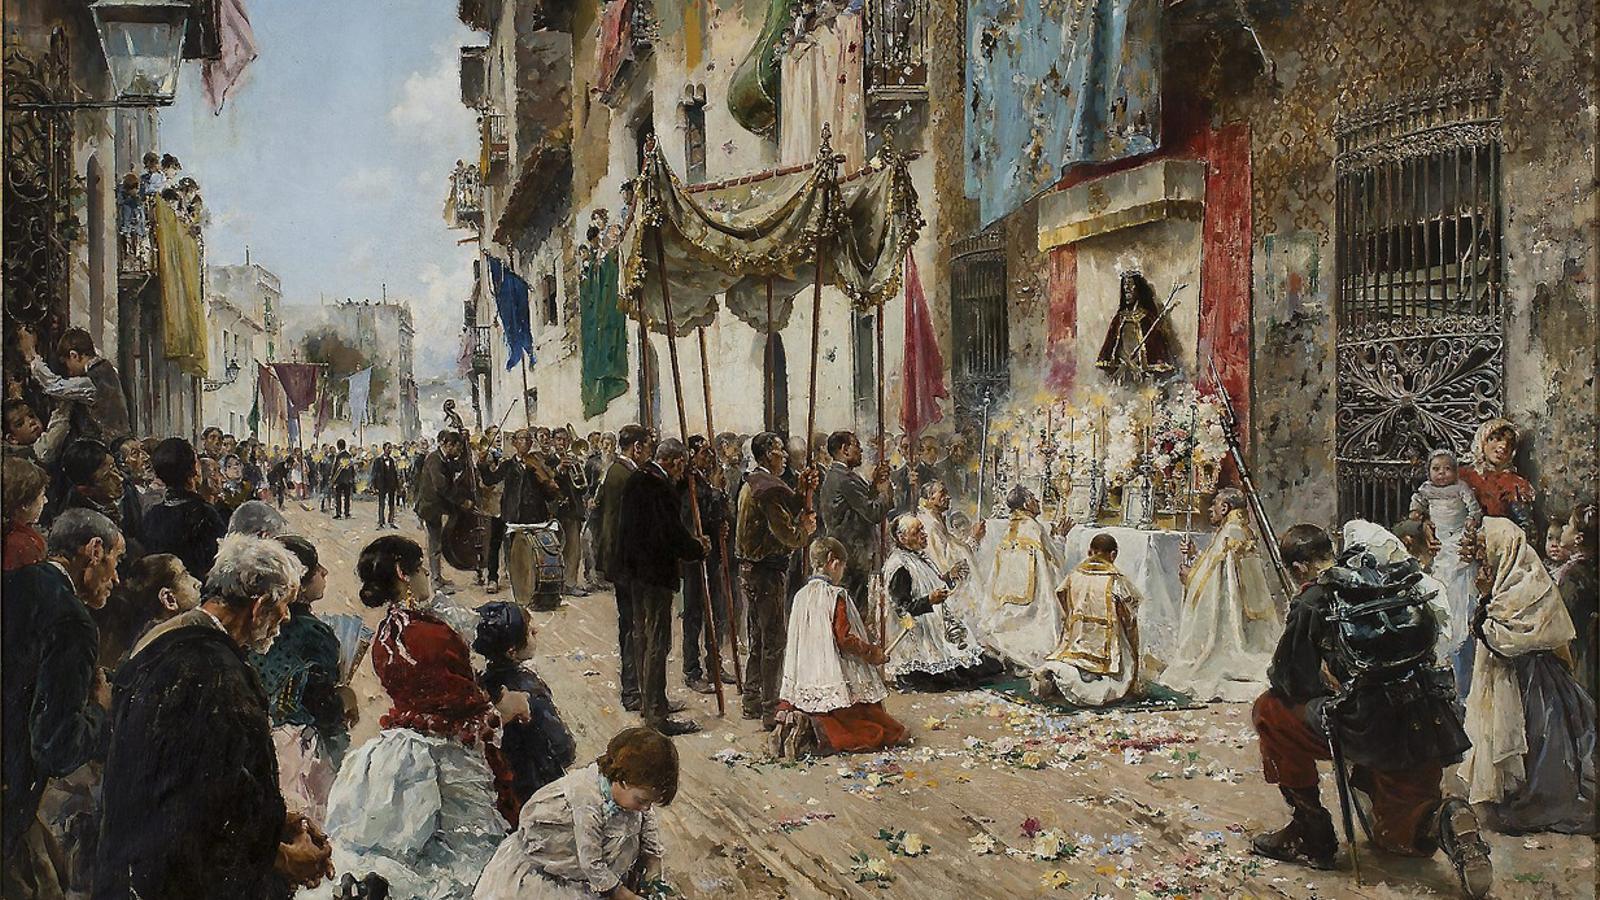 Recomendaciones de Pintura/Pintores Mas-Fondevila-que-Rusinol-Museu_1279682037_822938_1233x827